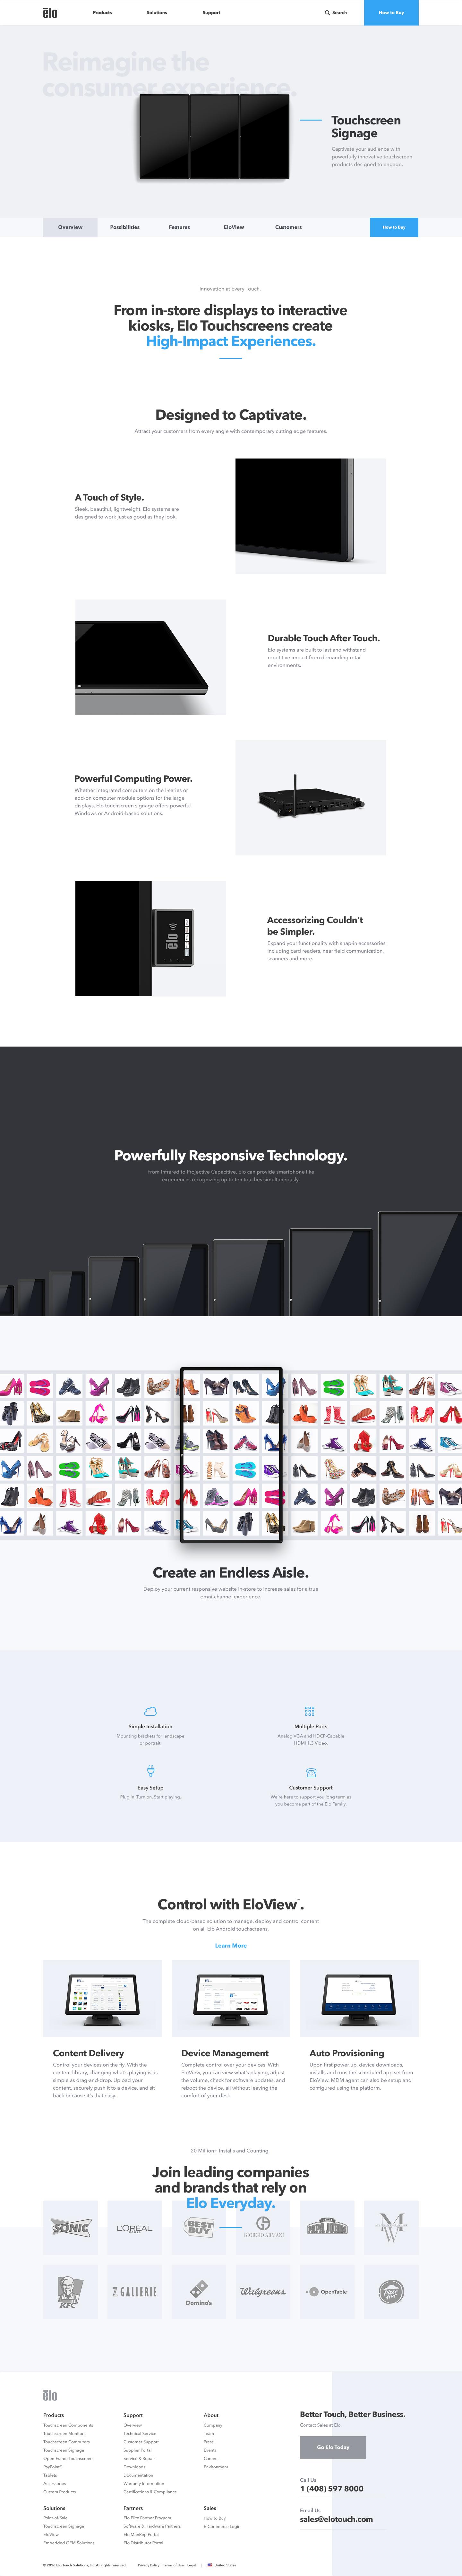 4.0 touchscreen signage.jpg